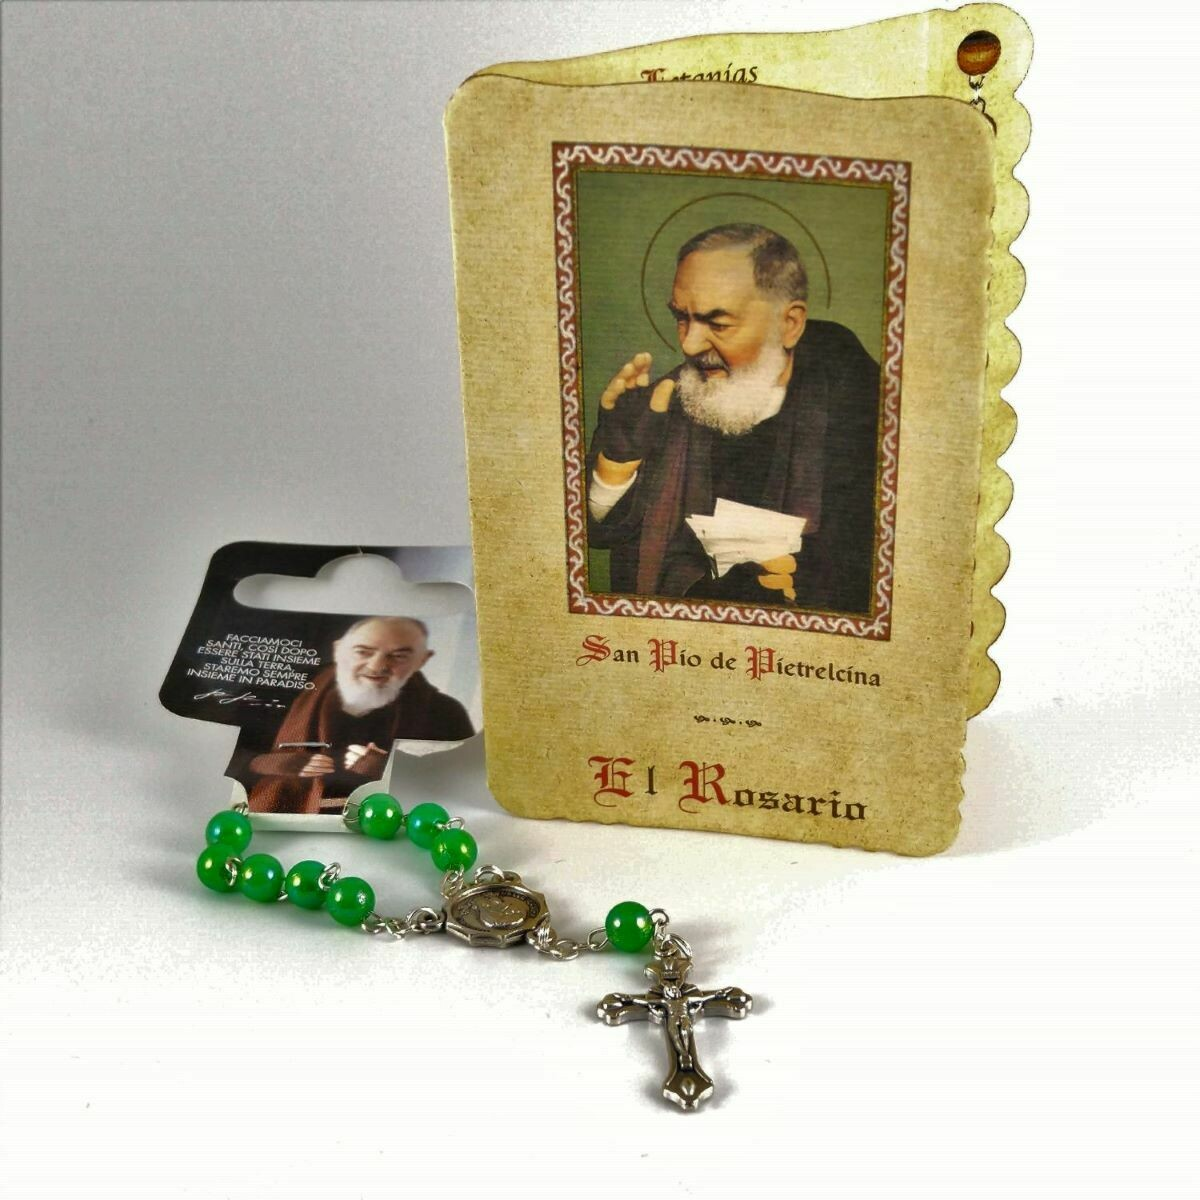 Decenio Padre Pío